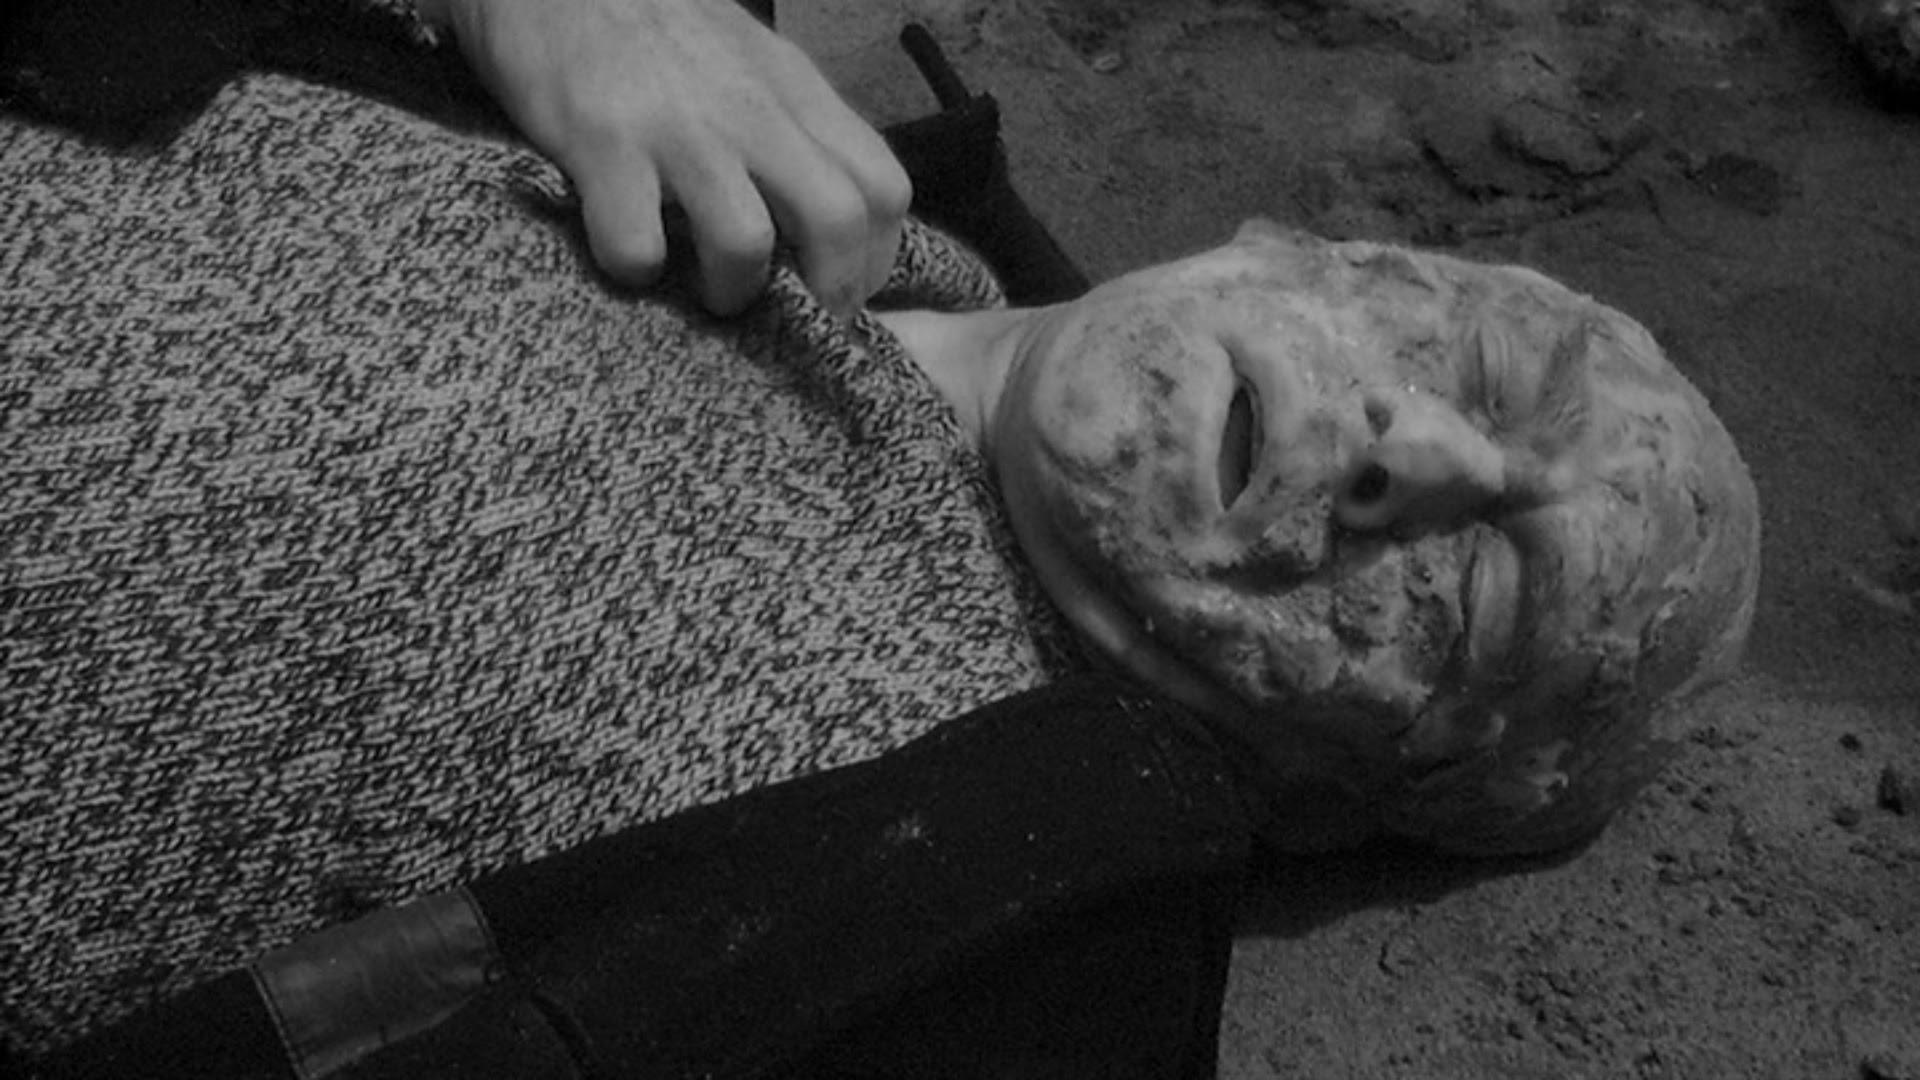 Another radiation victim.